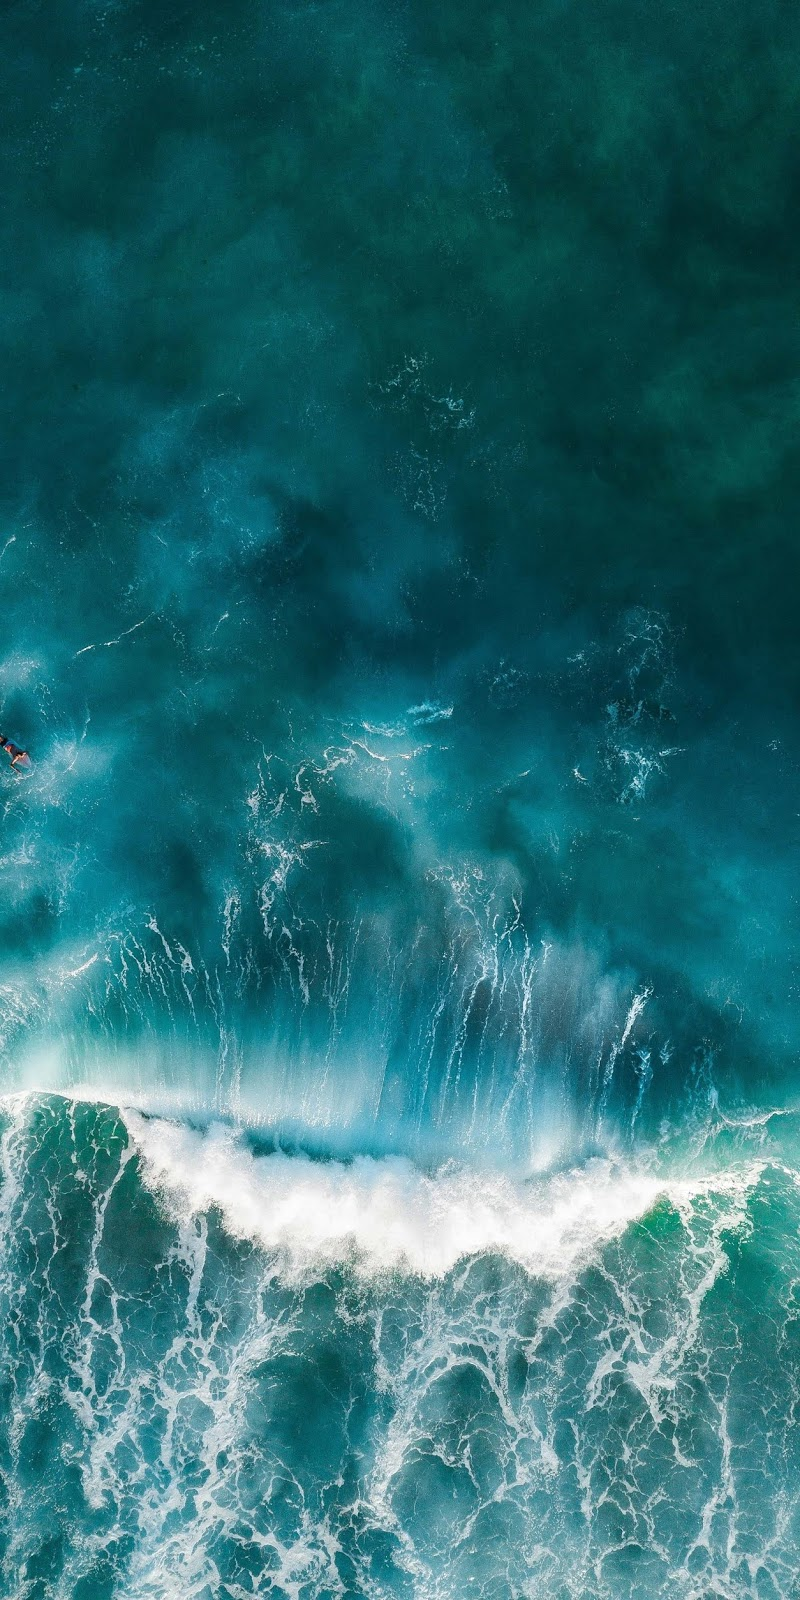 Wave 4 wallpaper